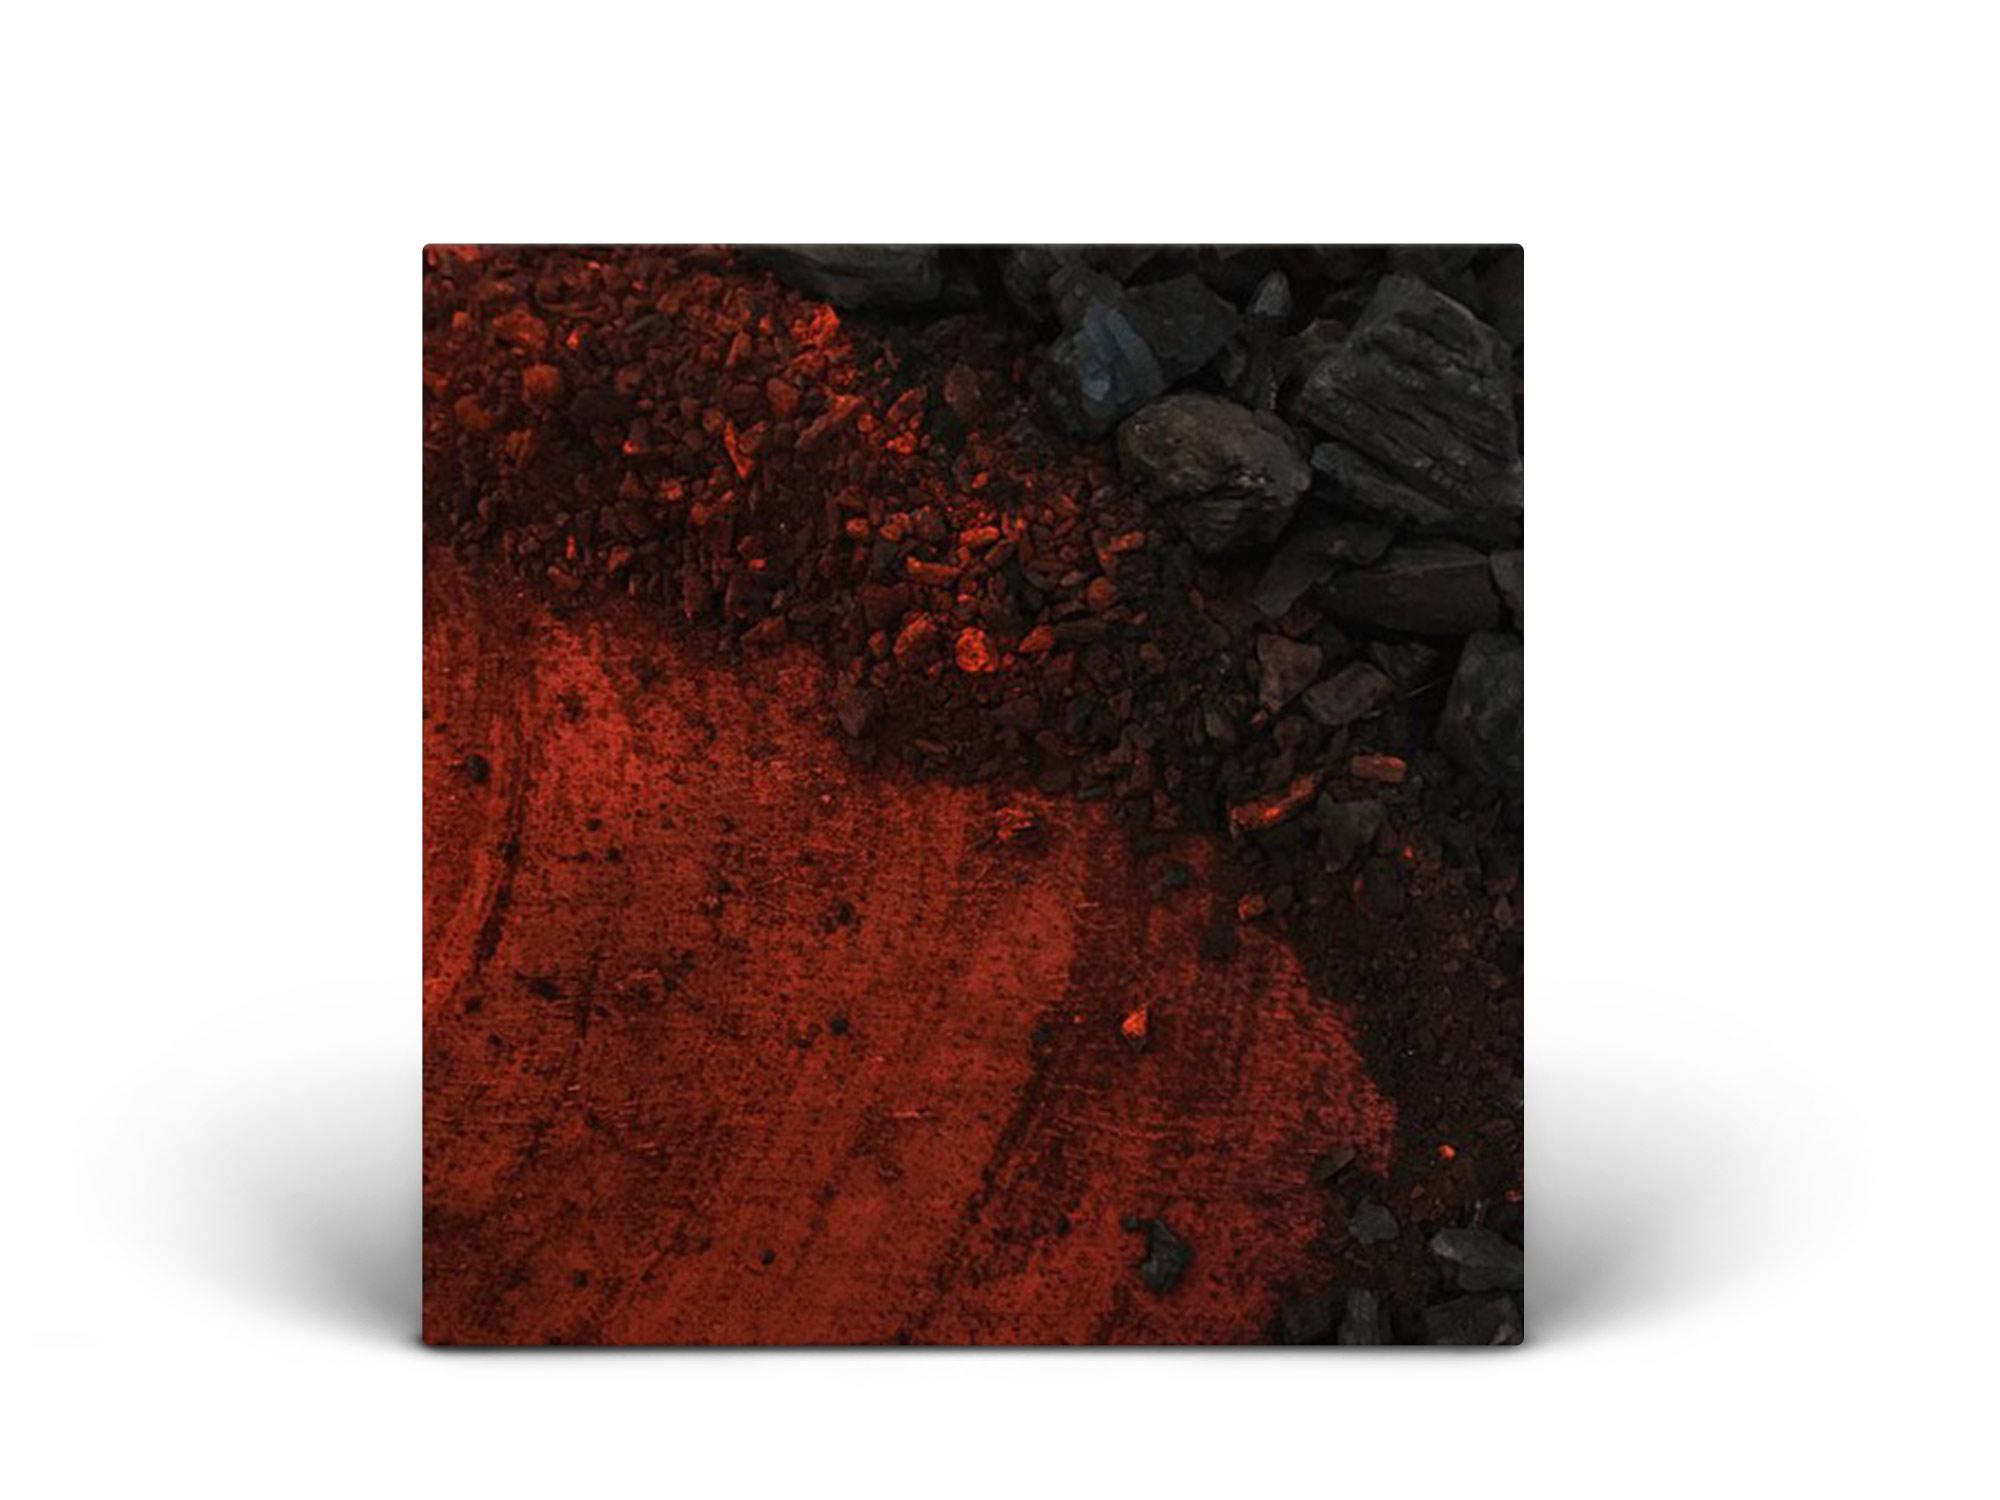 Rank & File / Moses Sumney - Best transformative work of art.